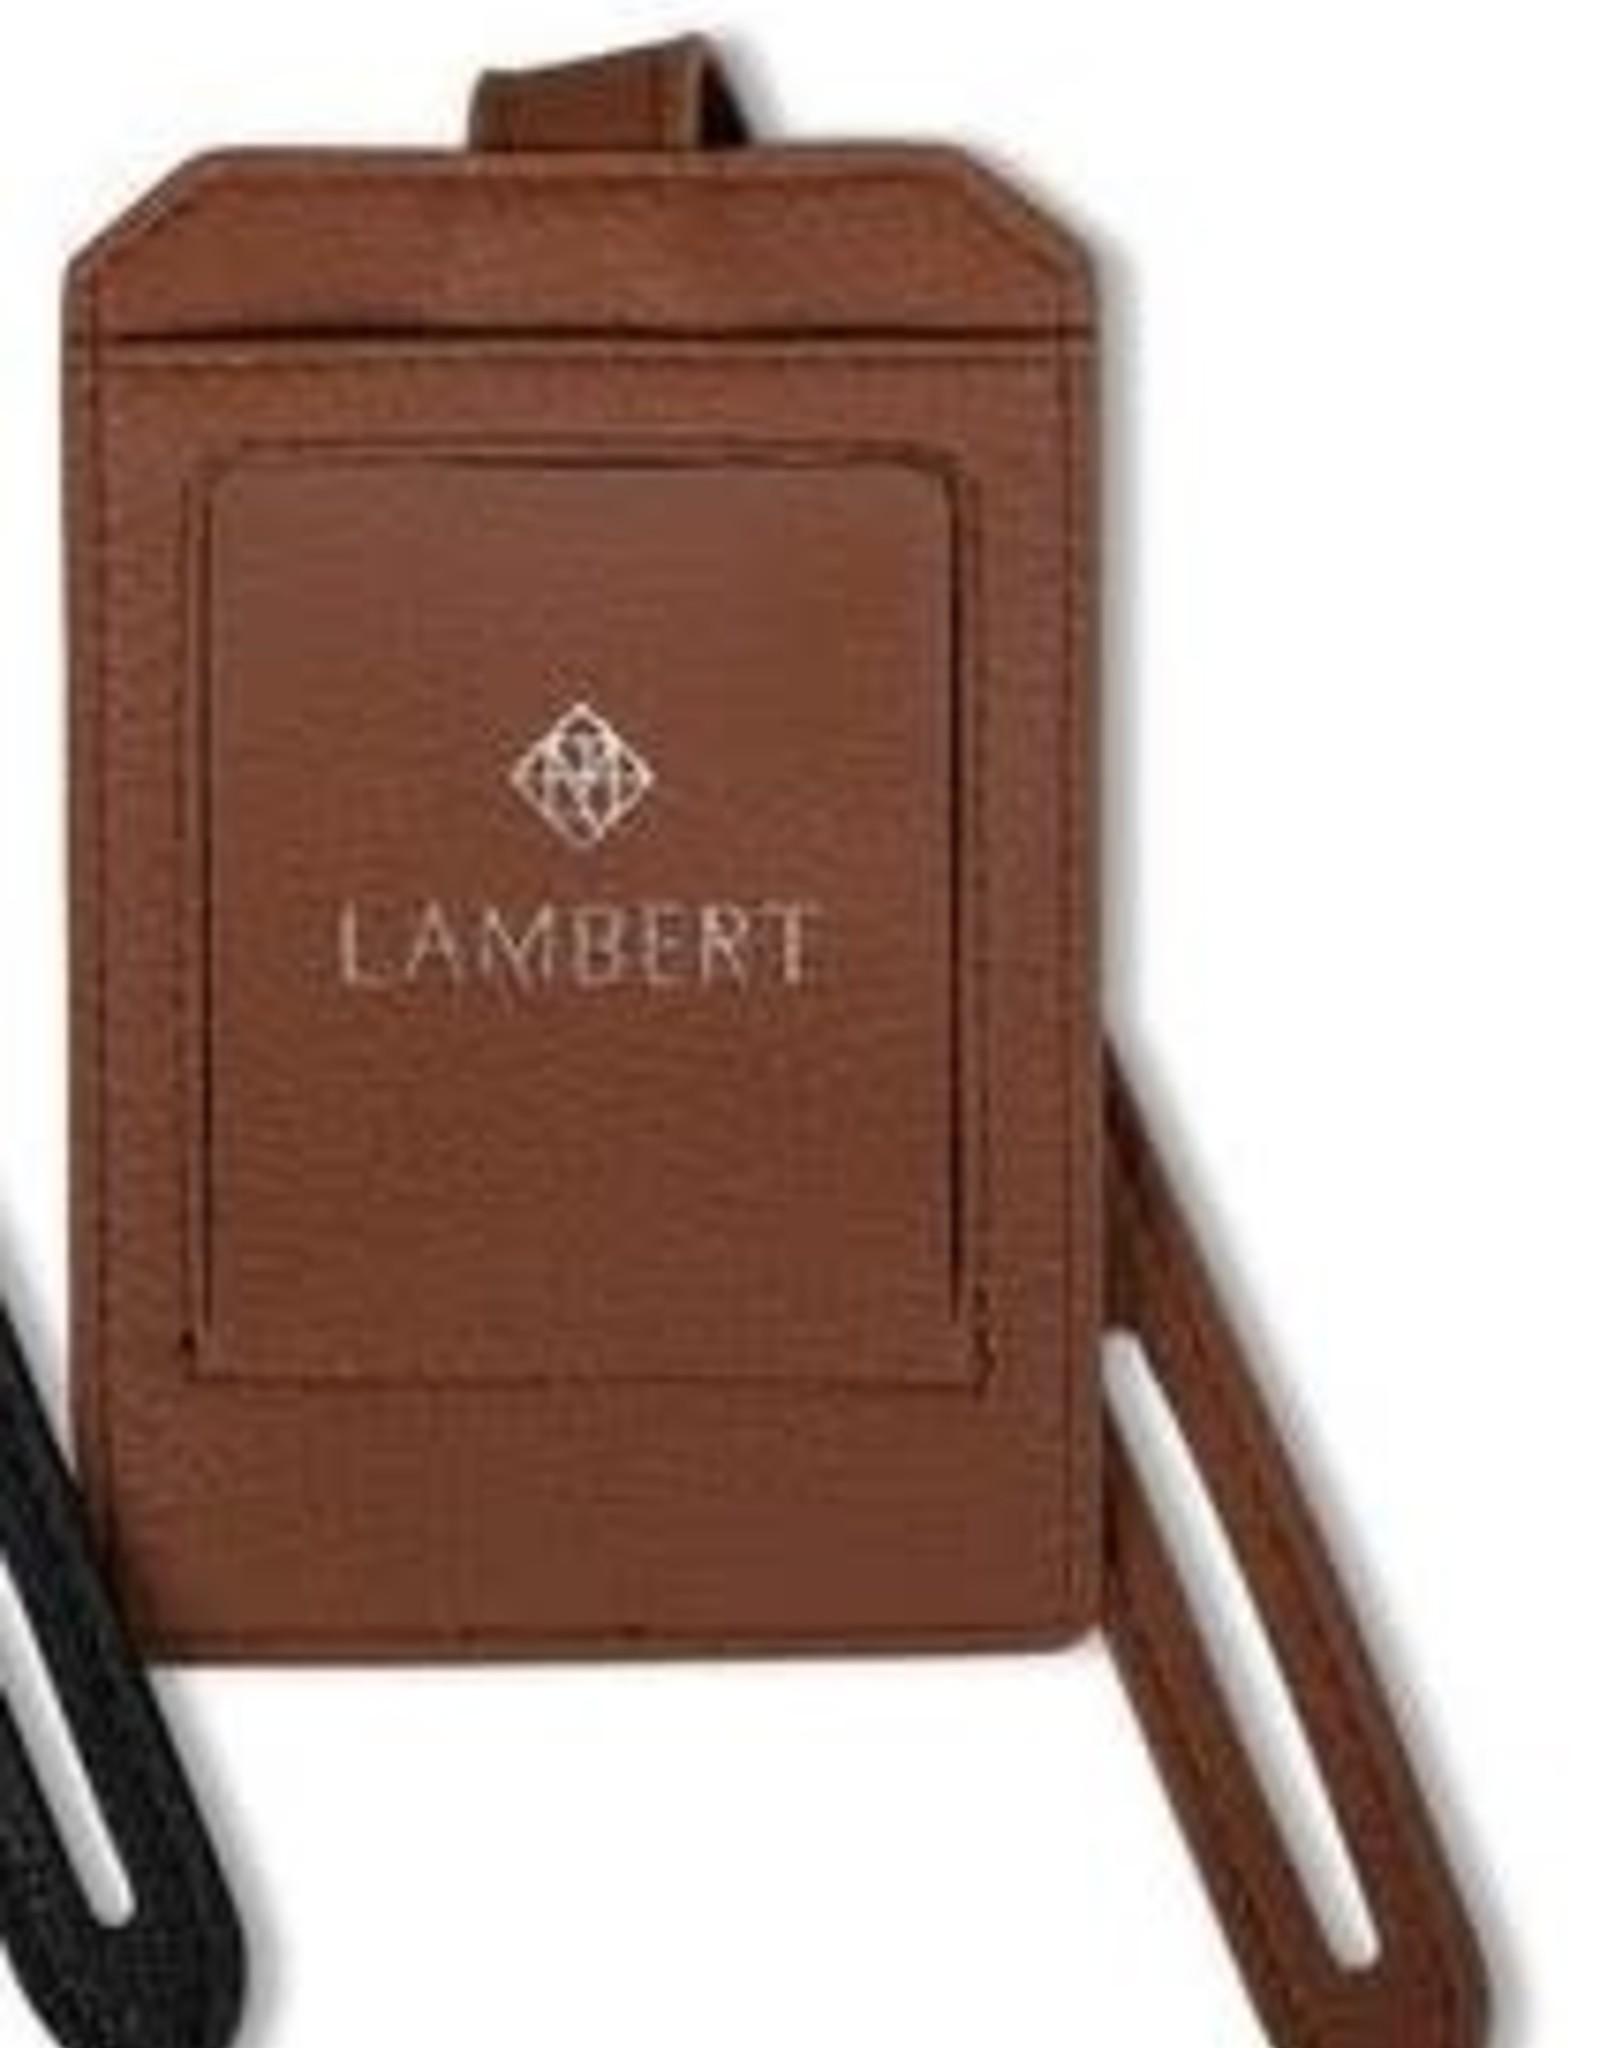 Lambert Étiquette de bagage Tan